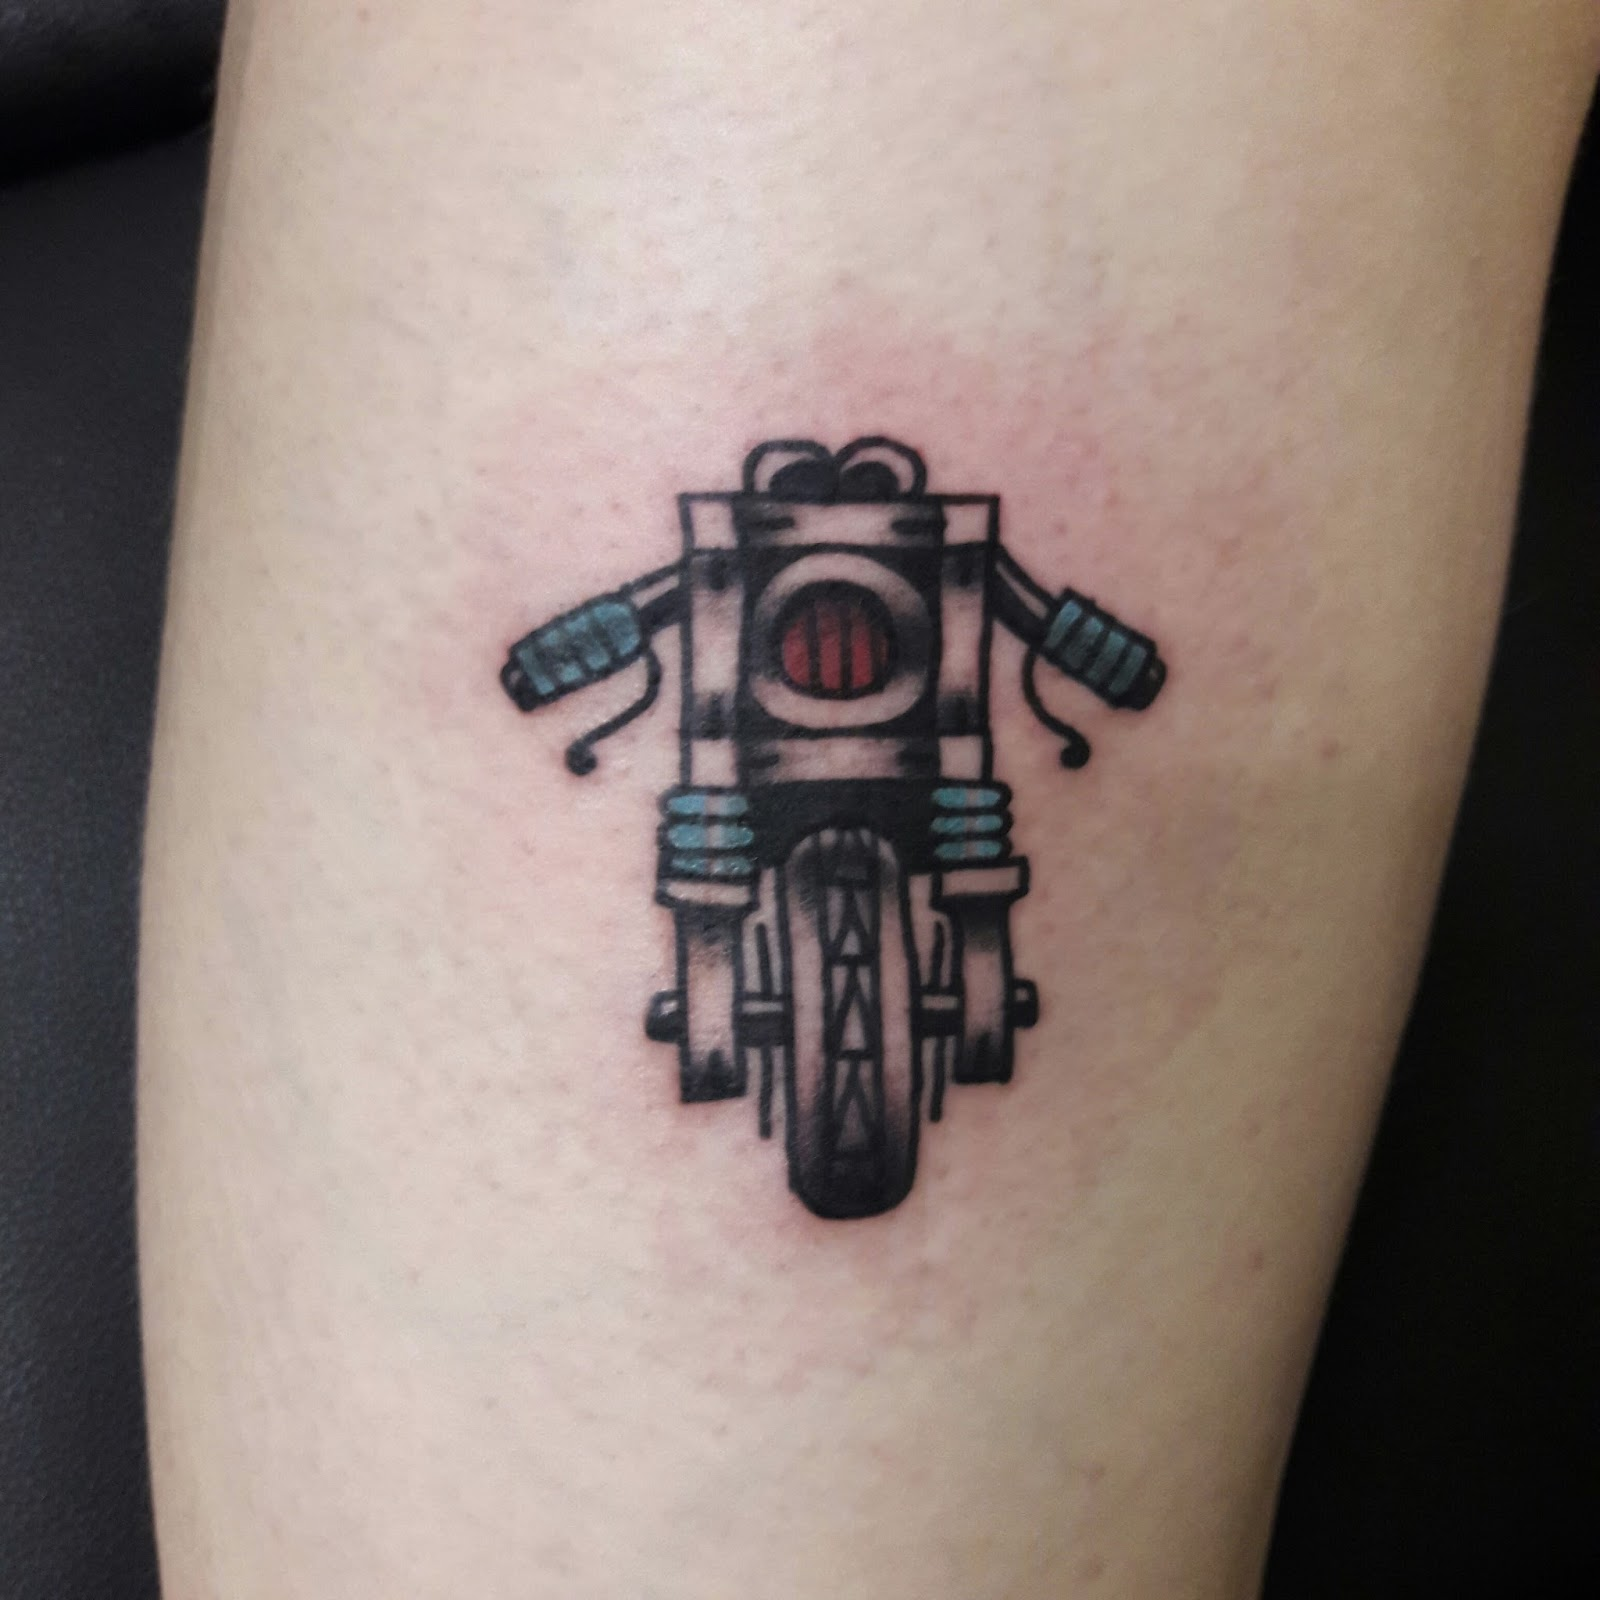 Tattoo lenny move ten manual shift for Tattoo amsterdam walk in